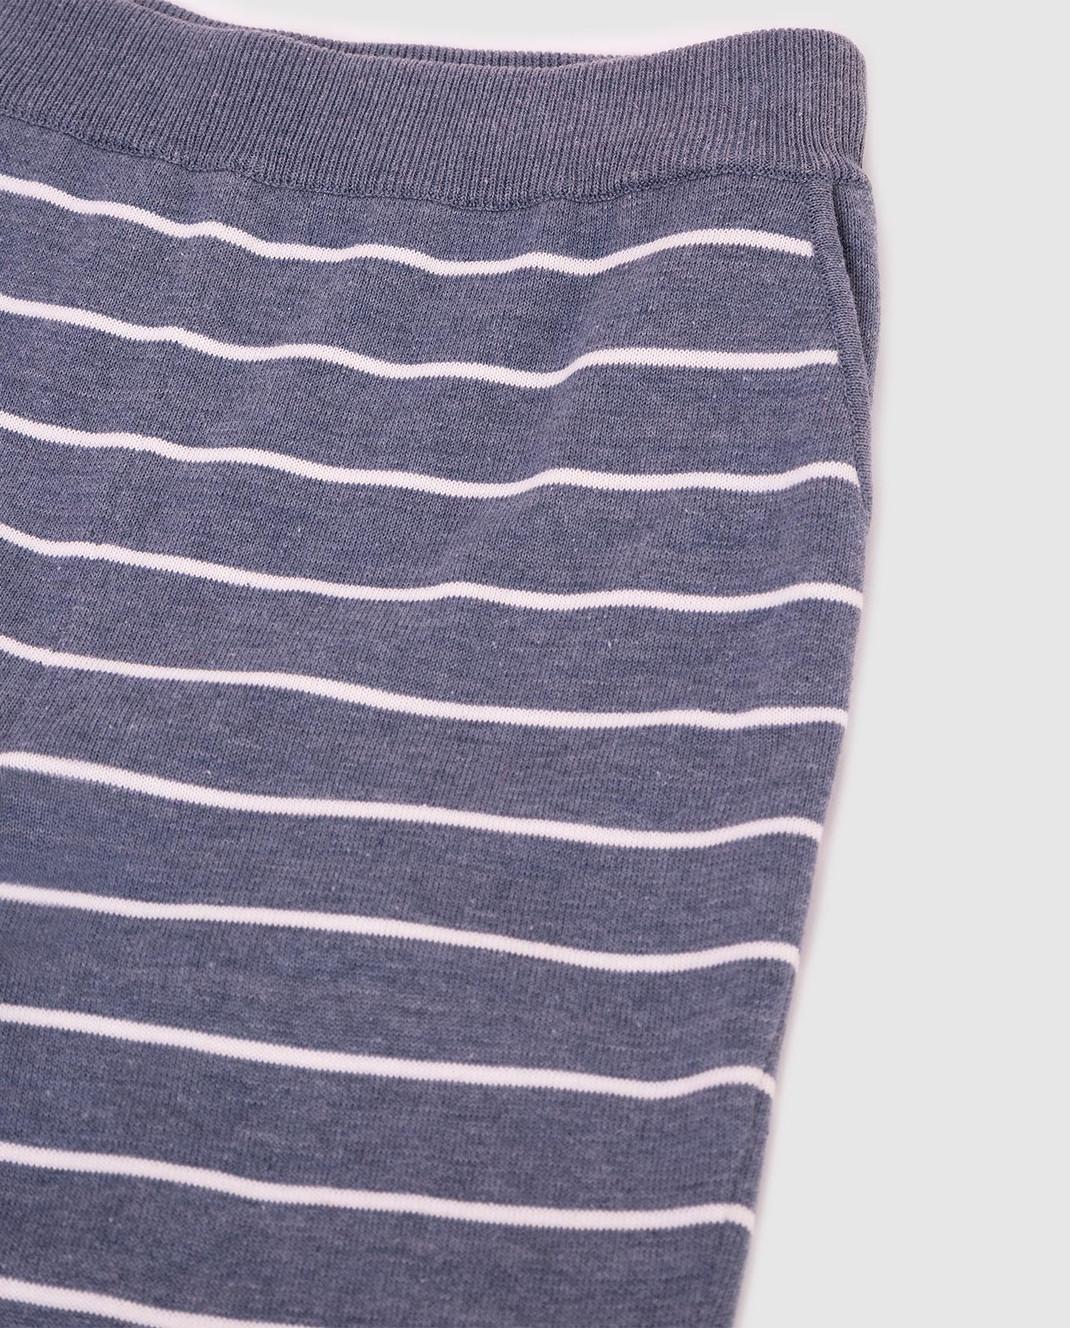 Loro Piana Детские серые брюки F1FAI0610 изображение 3